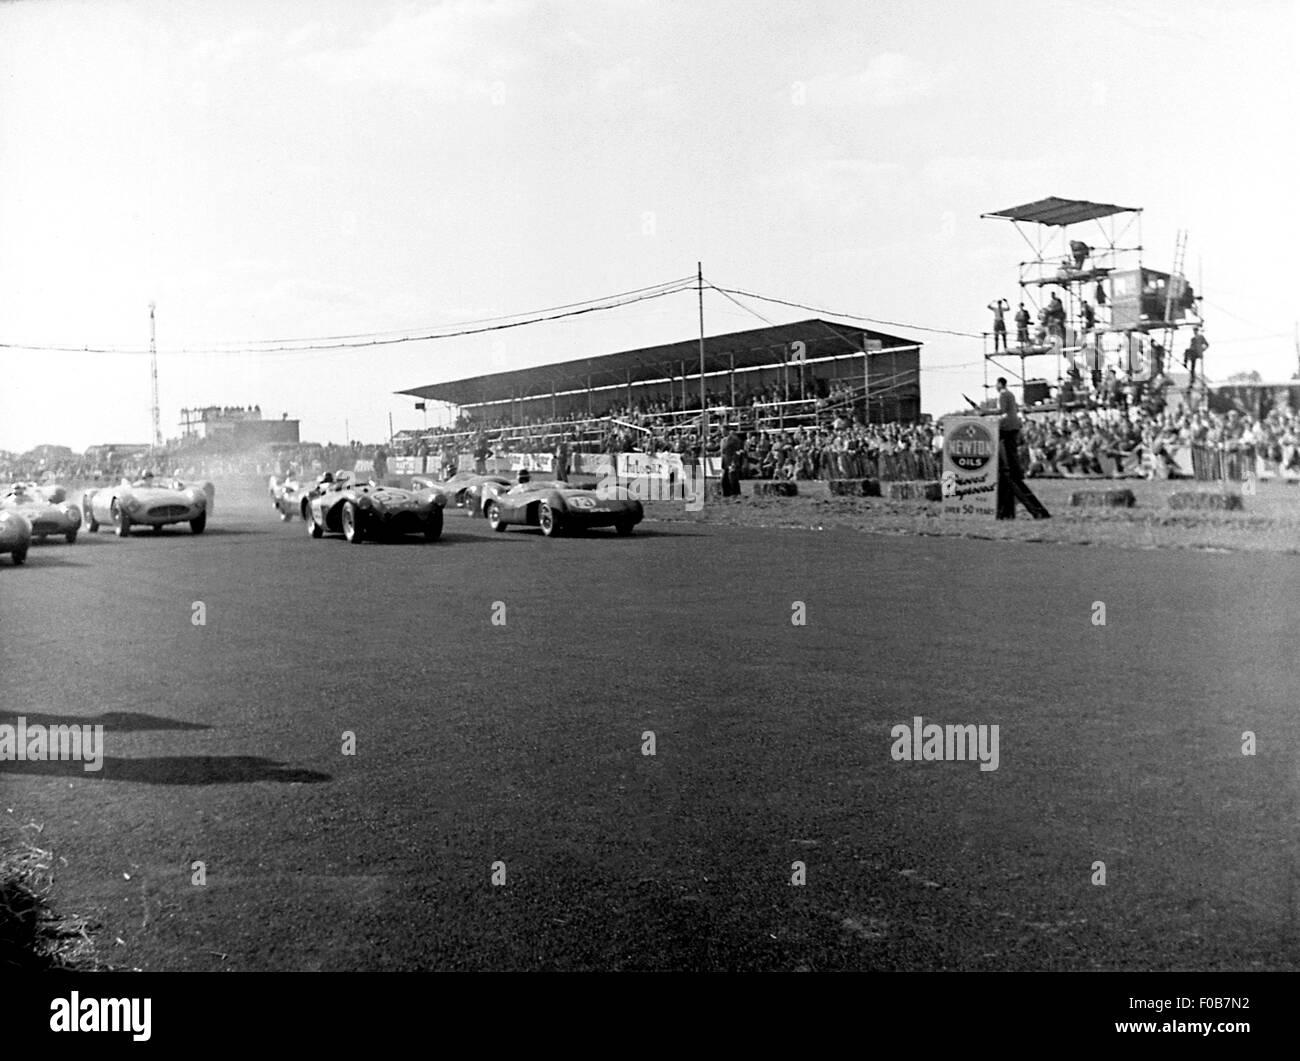 Connaught and Lotus MK IX racing cars - Stock Image